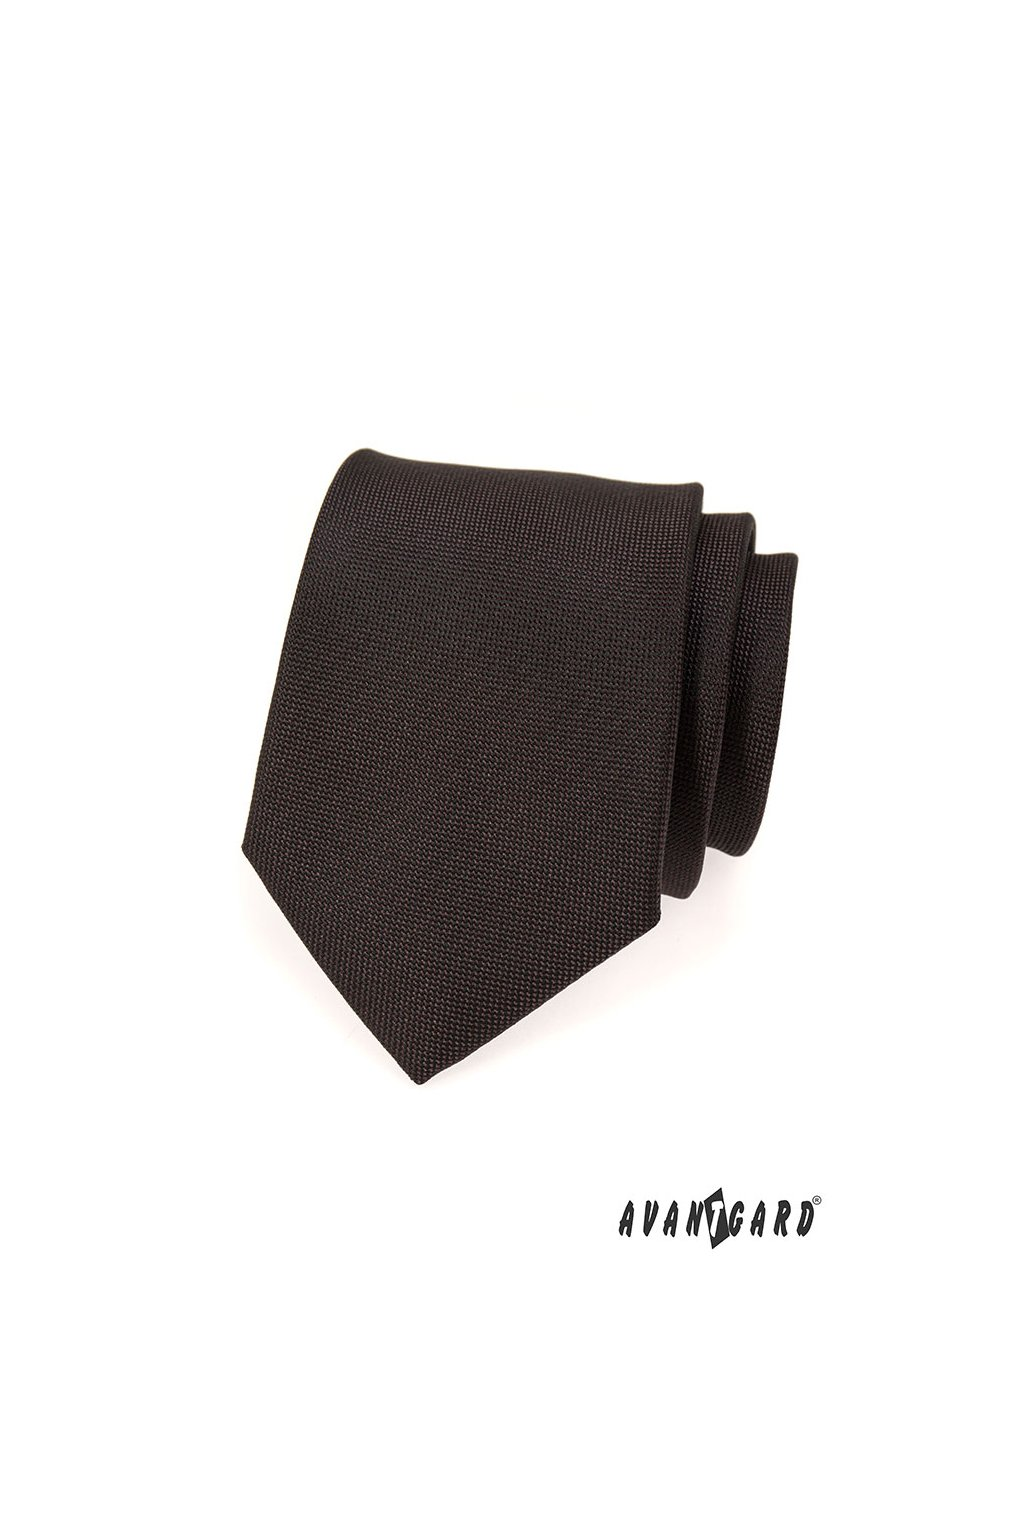 Hnědá vroubkovaná kravata